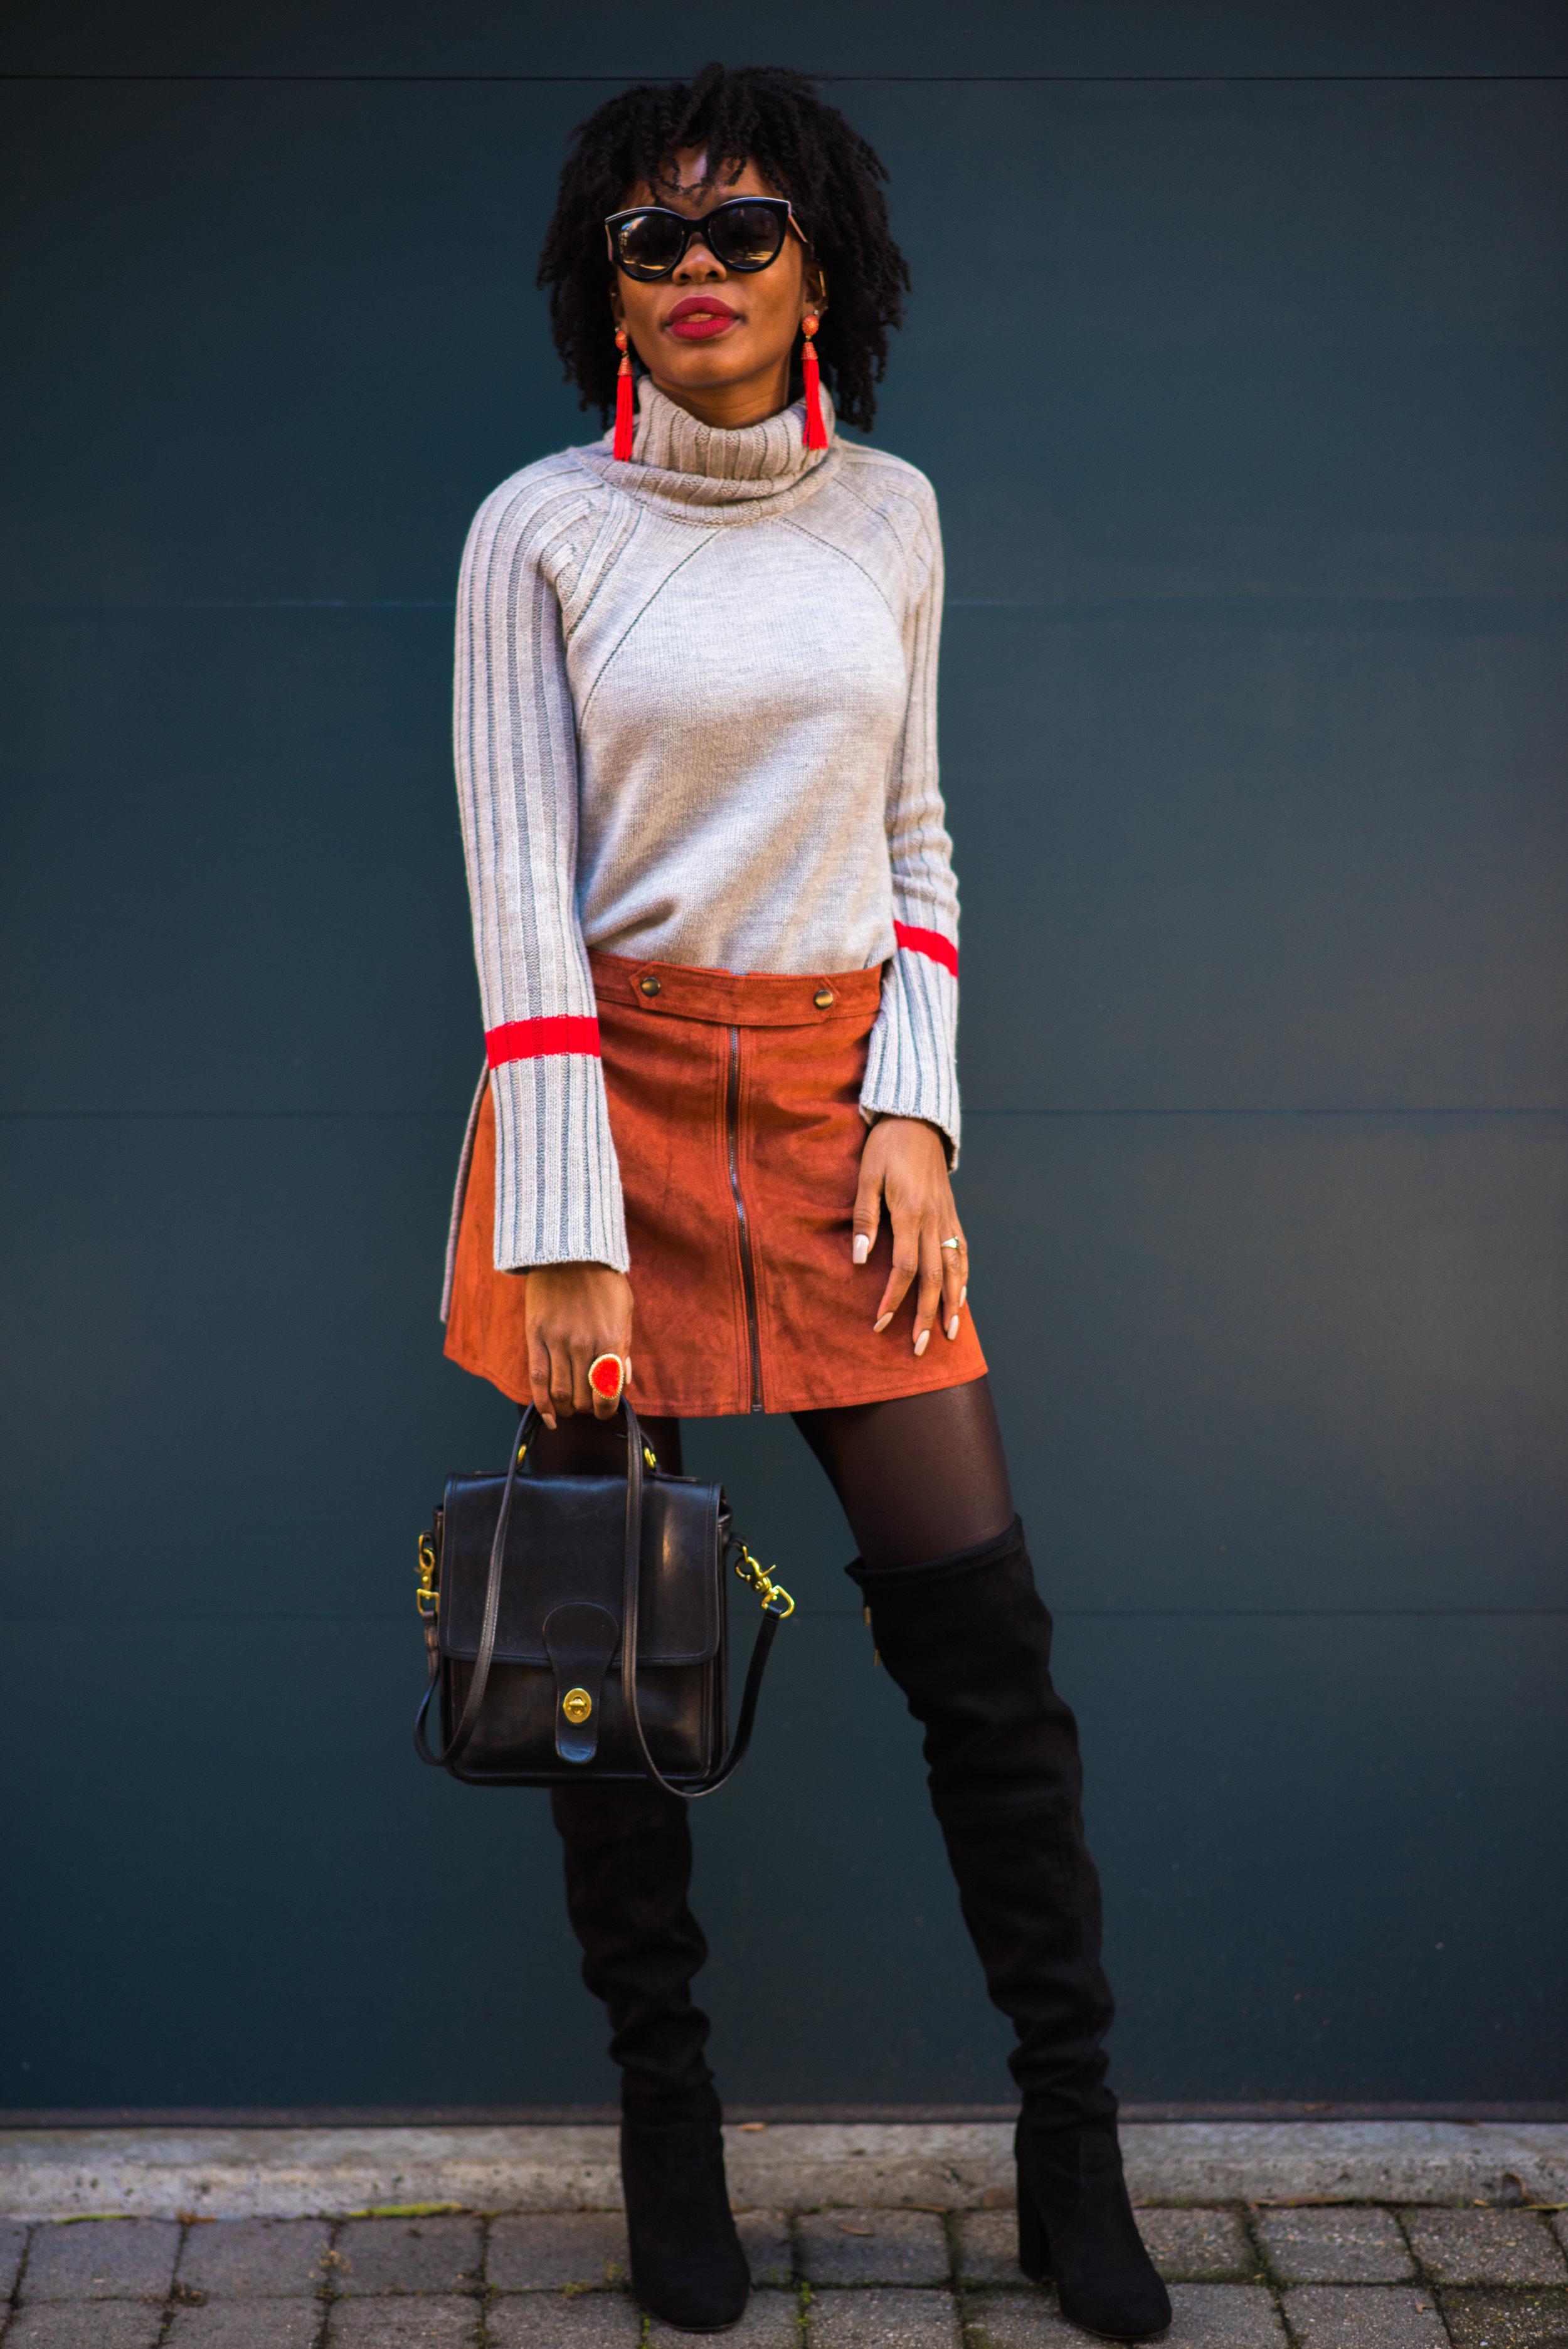 Sweater: Le Tote, Skirt: Forever 21, Boots: Steve Madden; Earrings: Le Tote; Sunglasses: Dolce & Gabbana